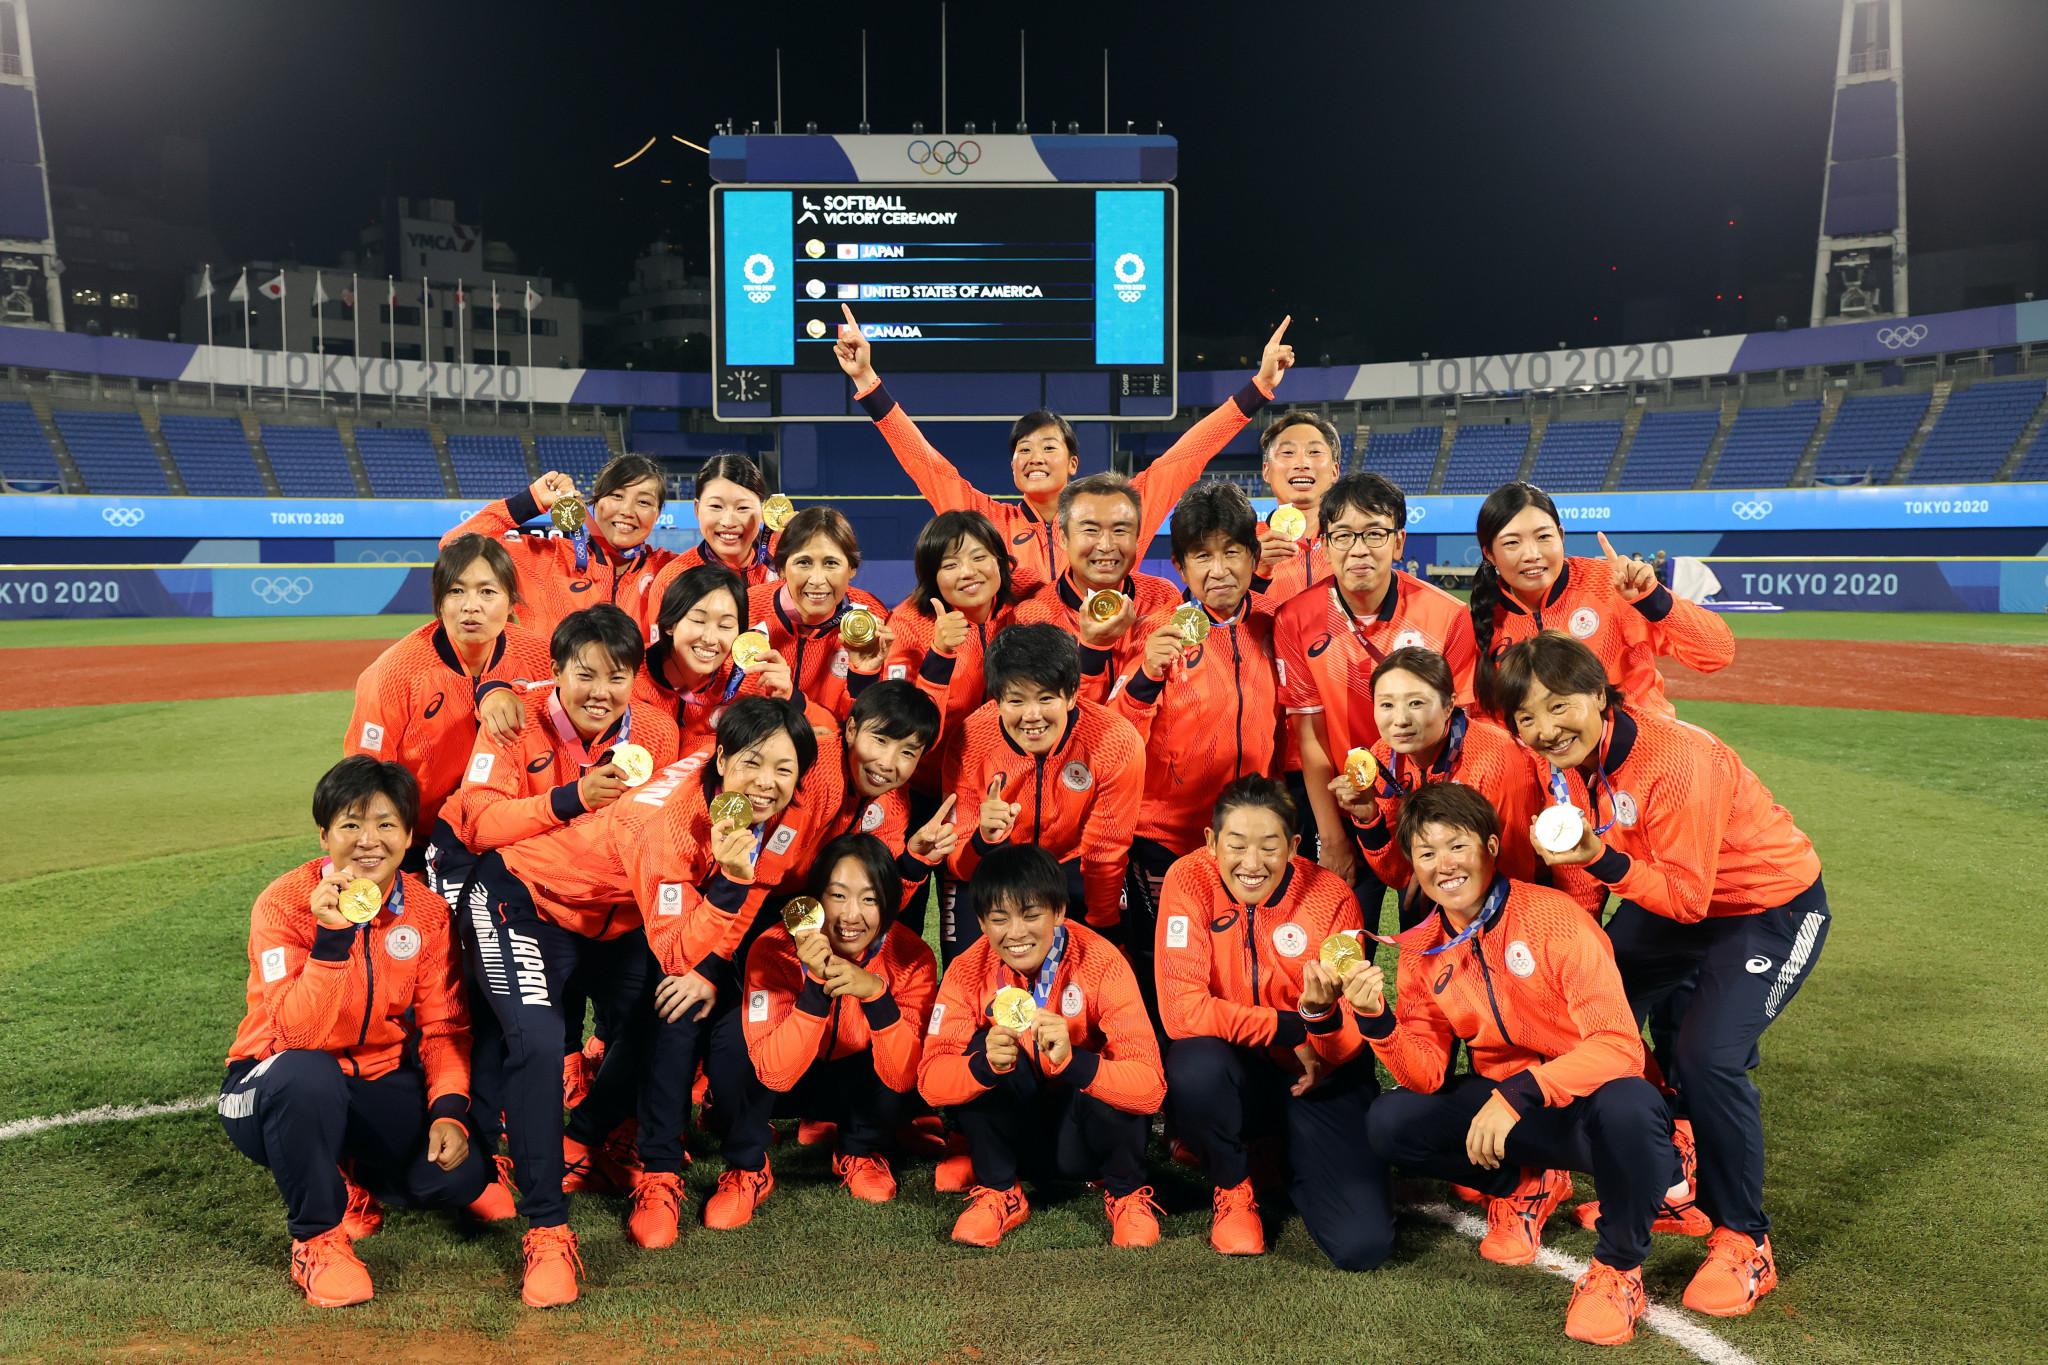 "Baseball and softball ""left their mark"" at Tokyo 2020, says WBSC President"